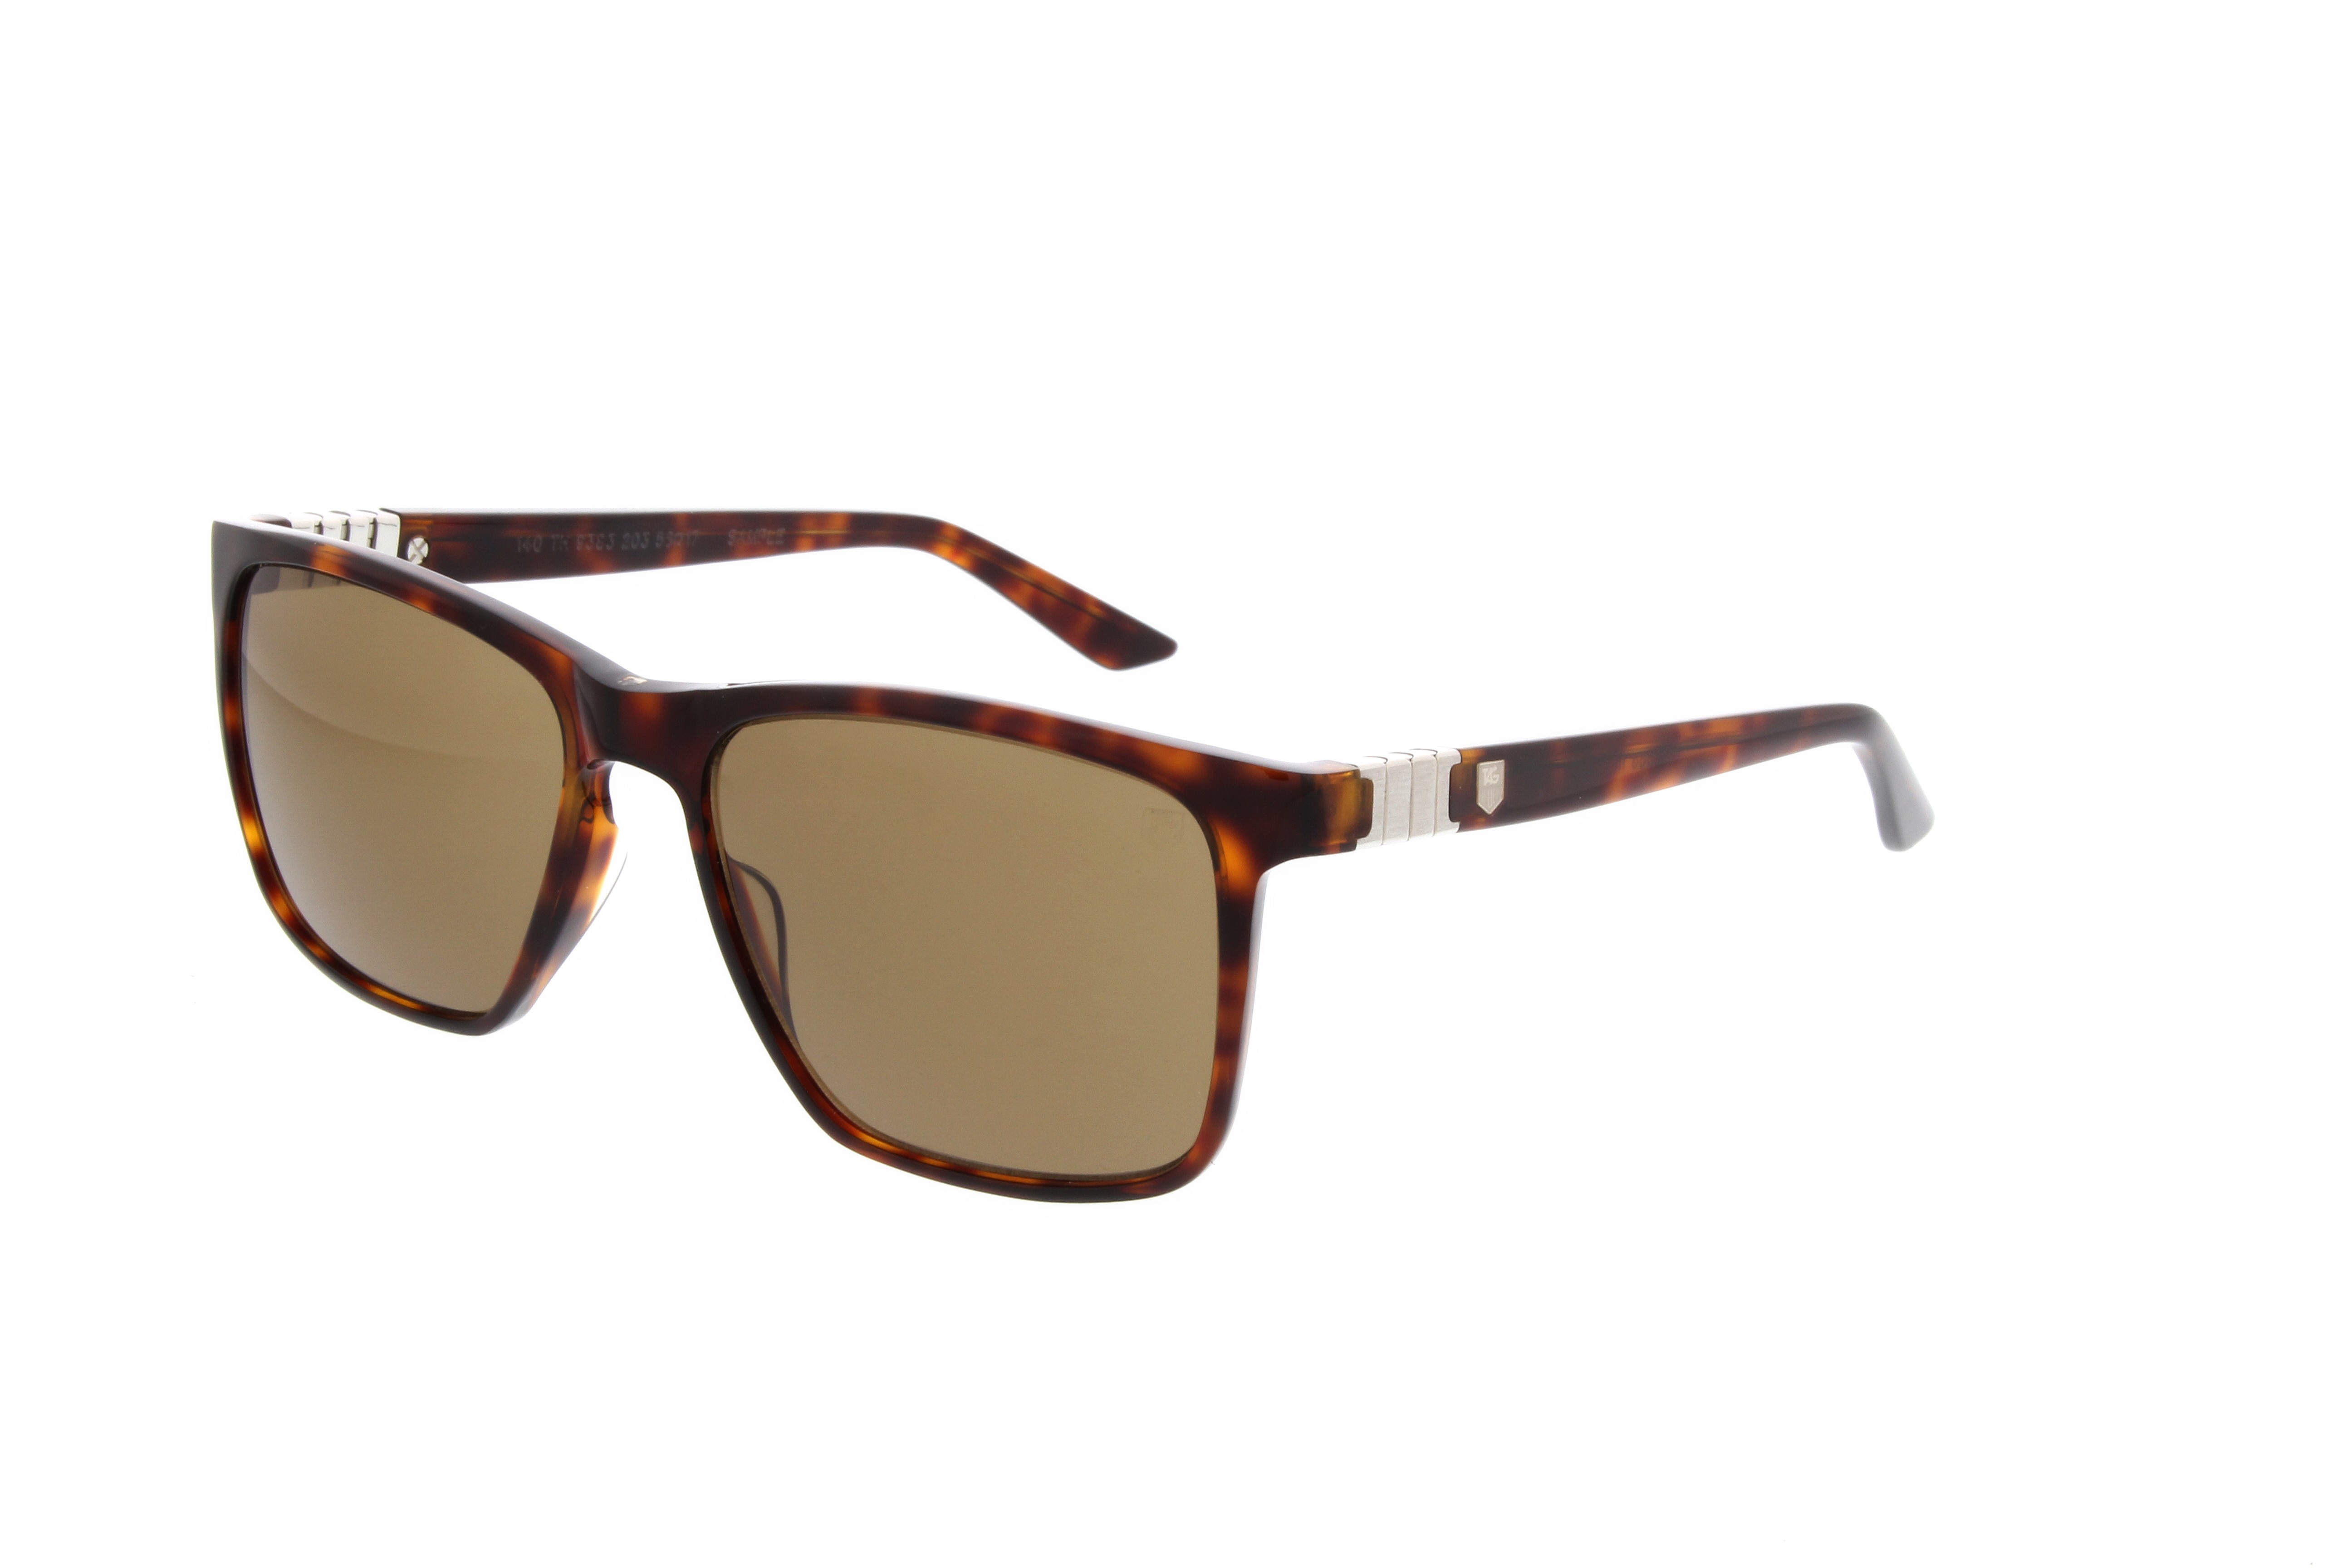 tag heuer sunglasses 8yxx  TAG HEUER 9383 LEGEND ACETATE 203